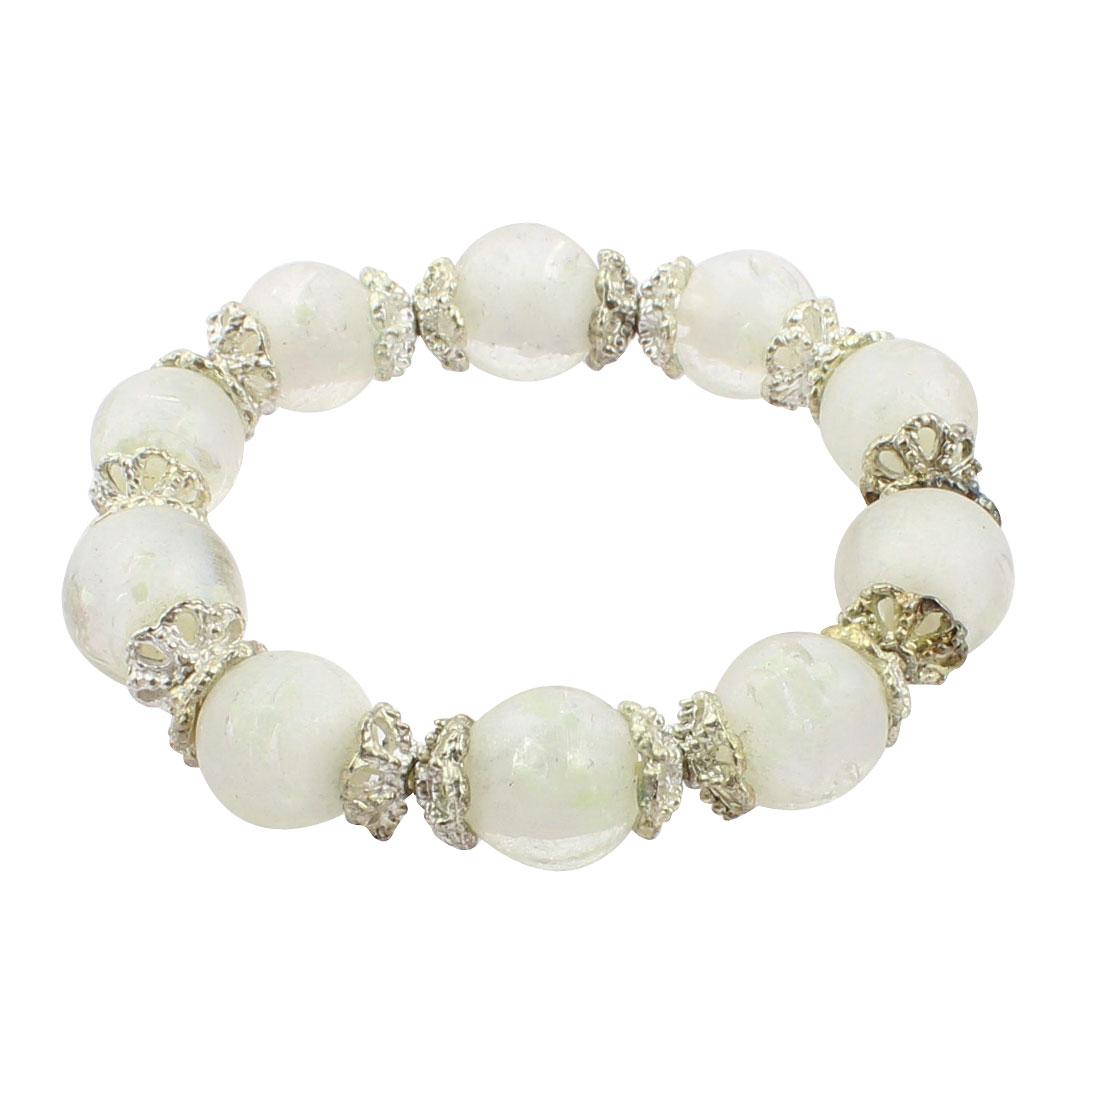 Lady Plastic Luminous Beaded Flower Decor Bungee Bracelet White